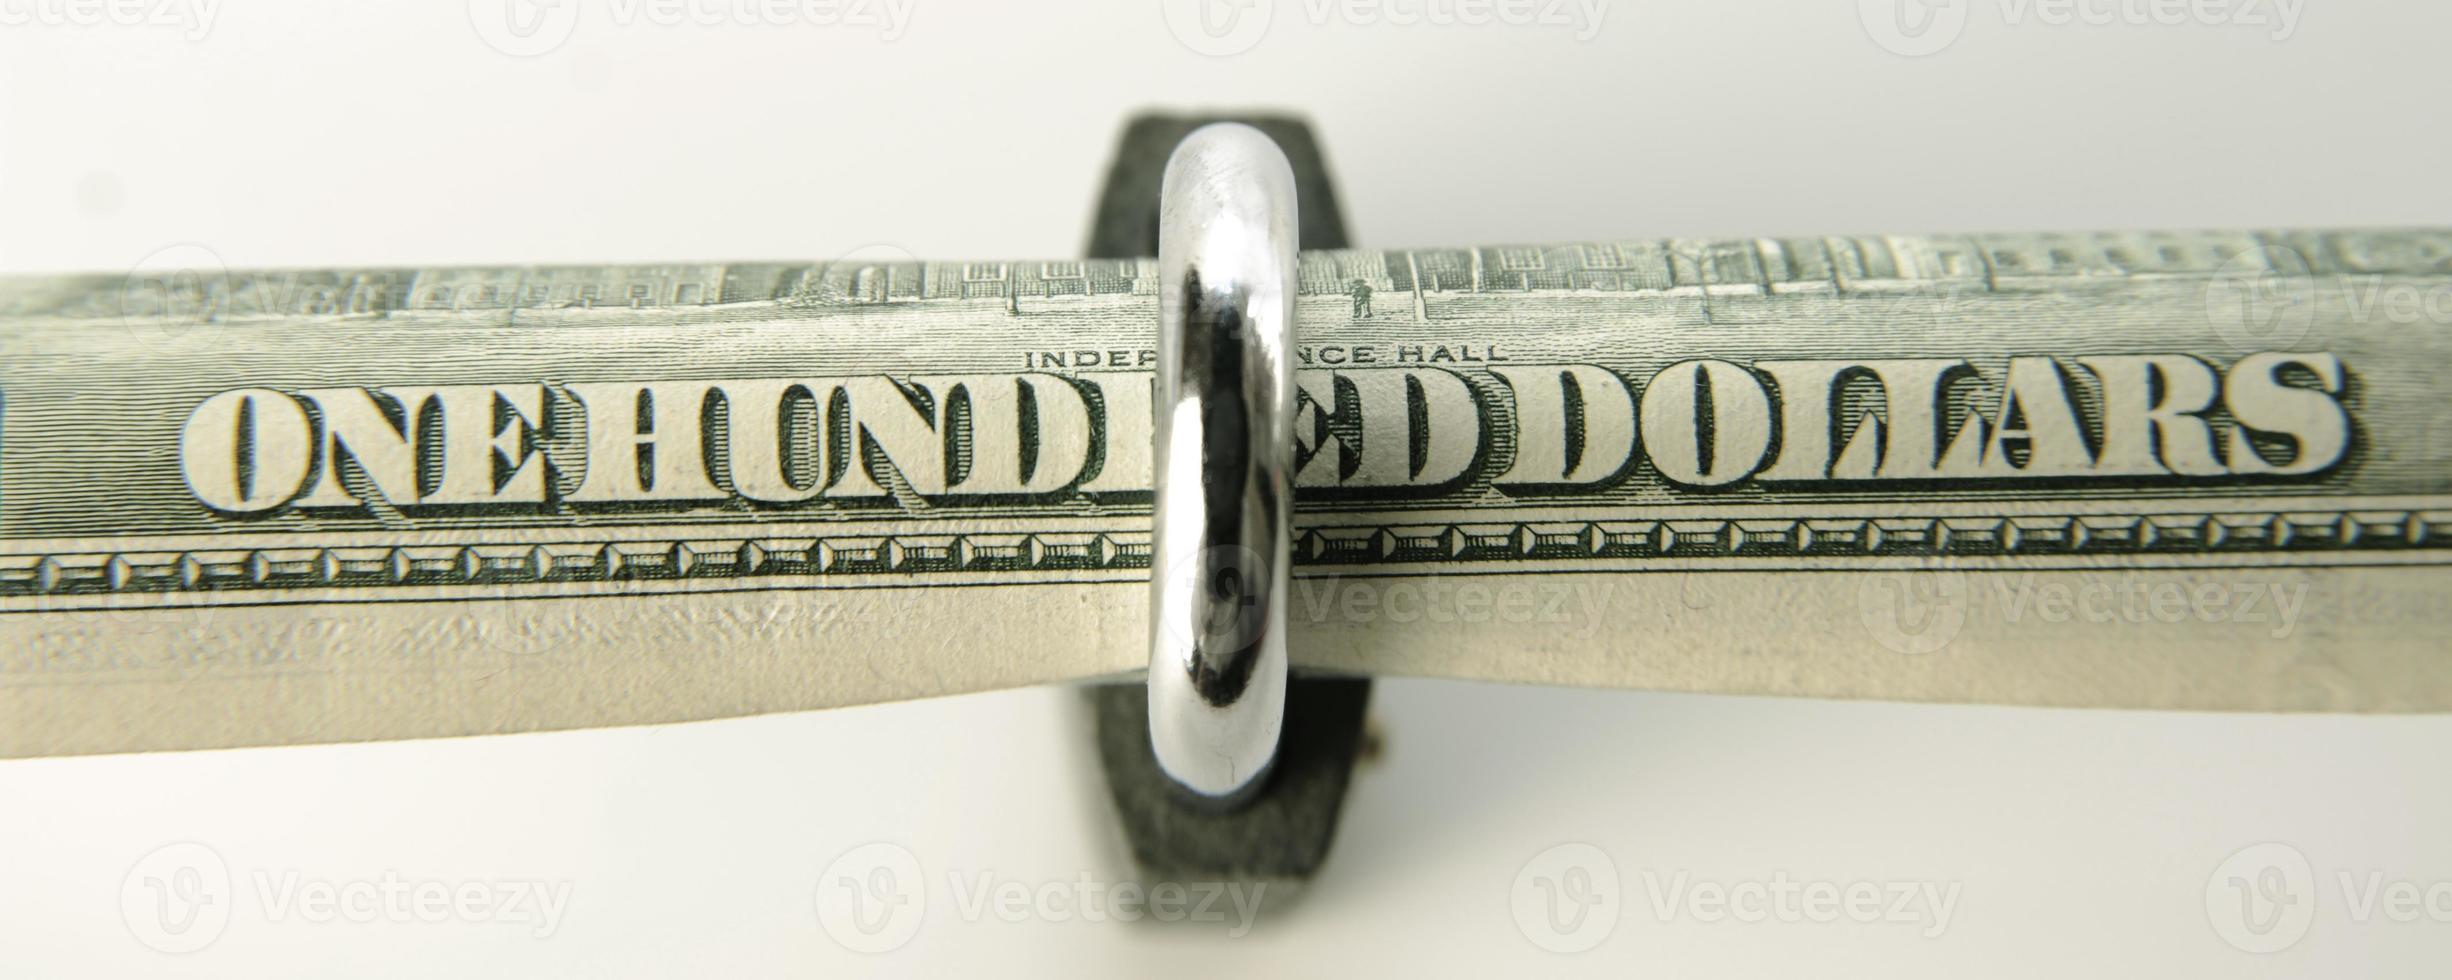 geld beveiliging serie foto